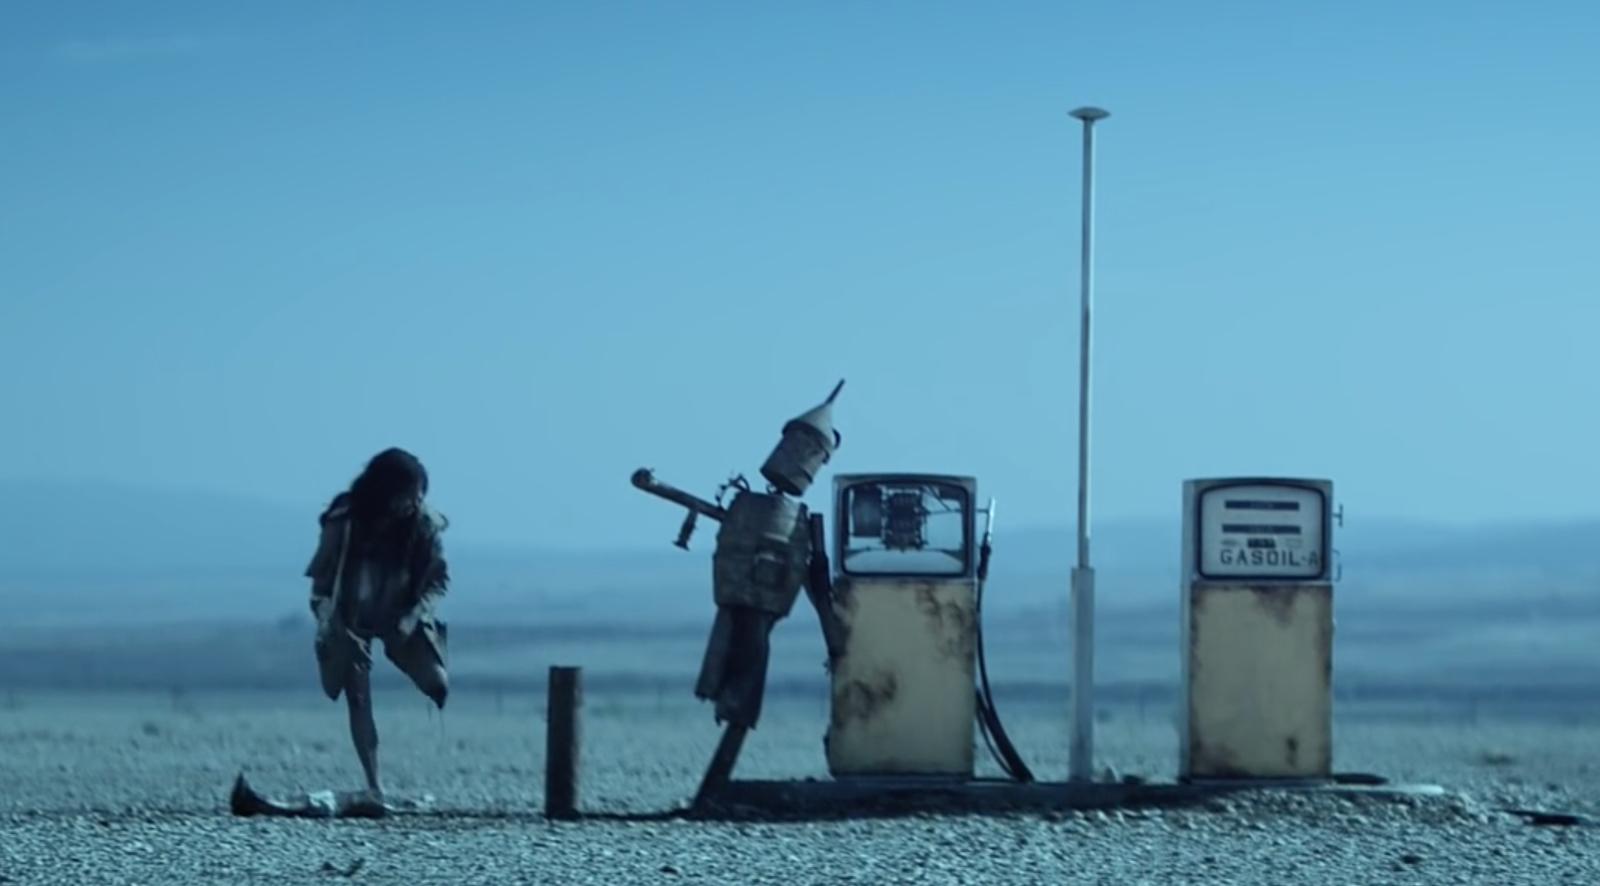 VIDEO | Ne plac roboții canibali din cel mai nou videoclip The Chemical Brothers